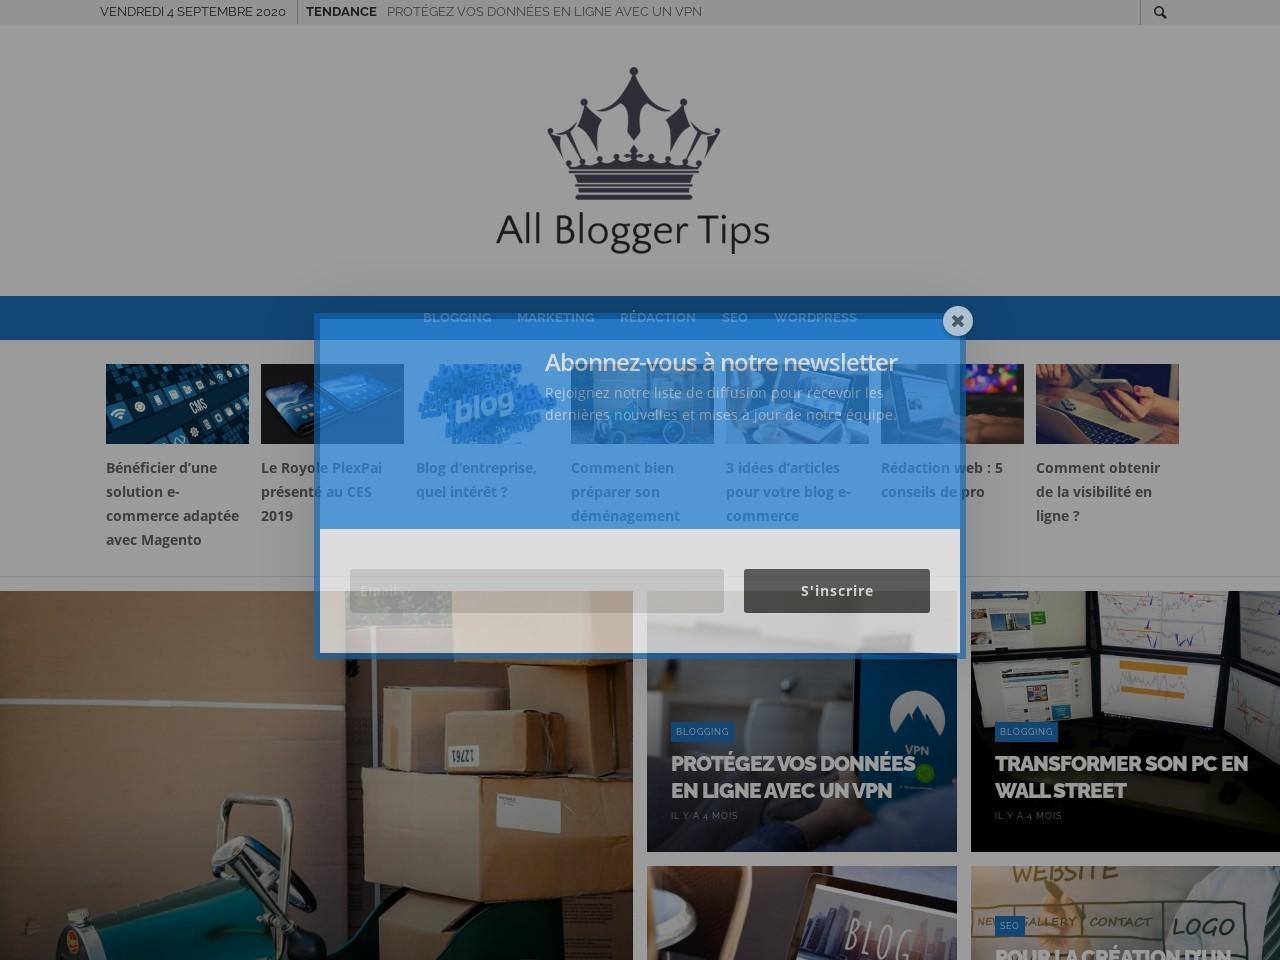 allblogger.tips